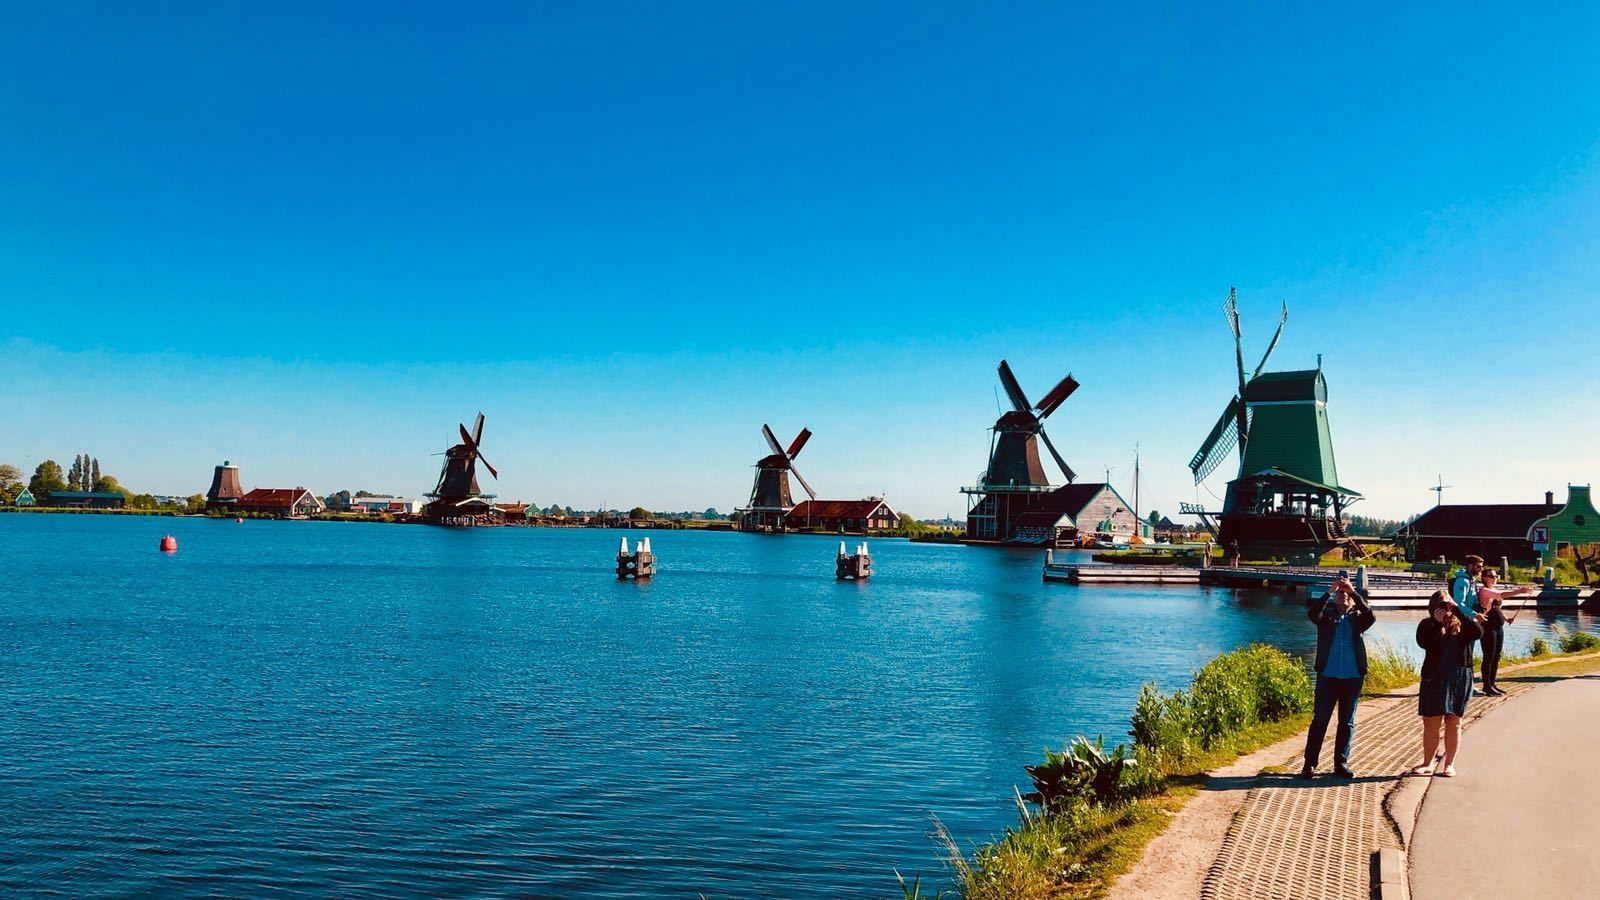 Mills of Zaanse Schans